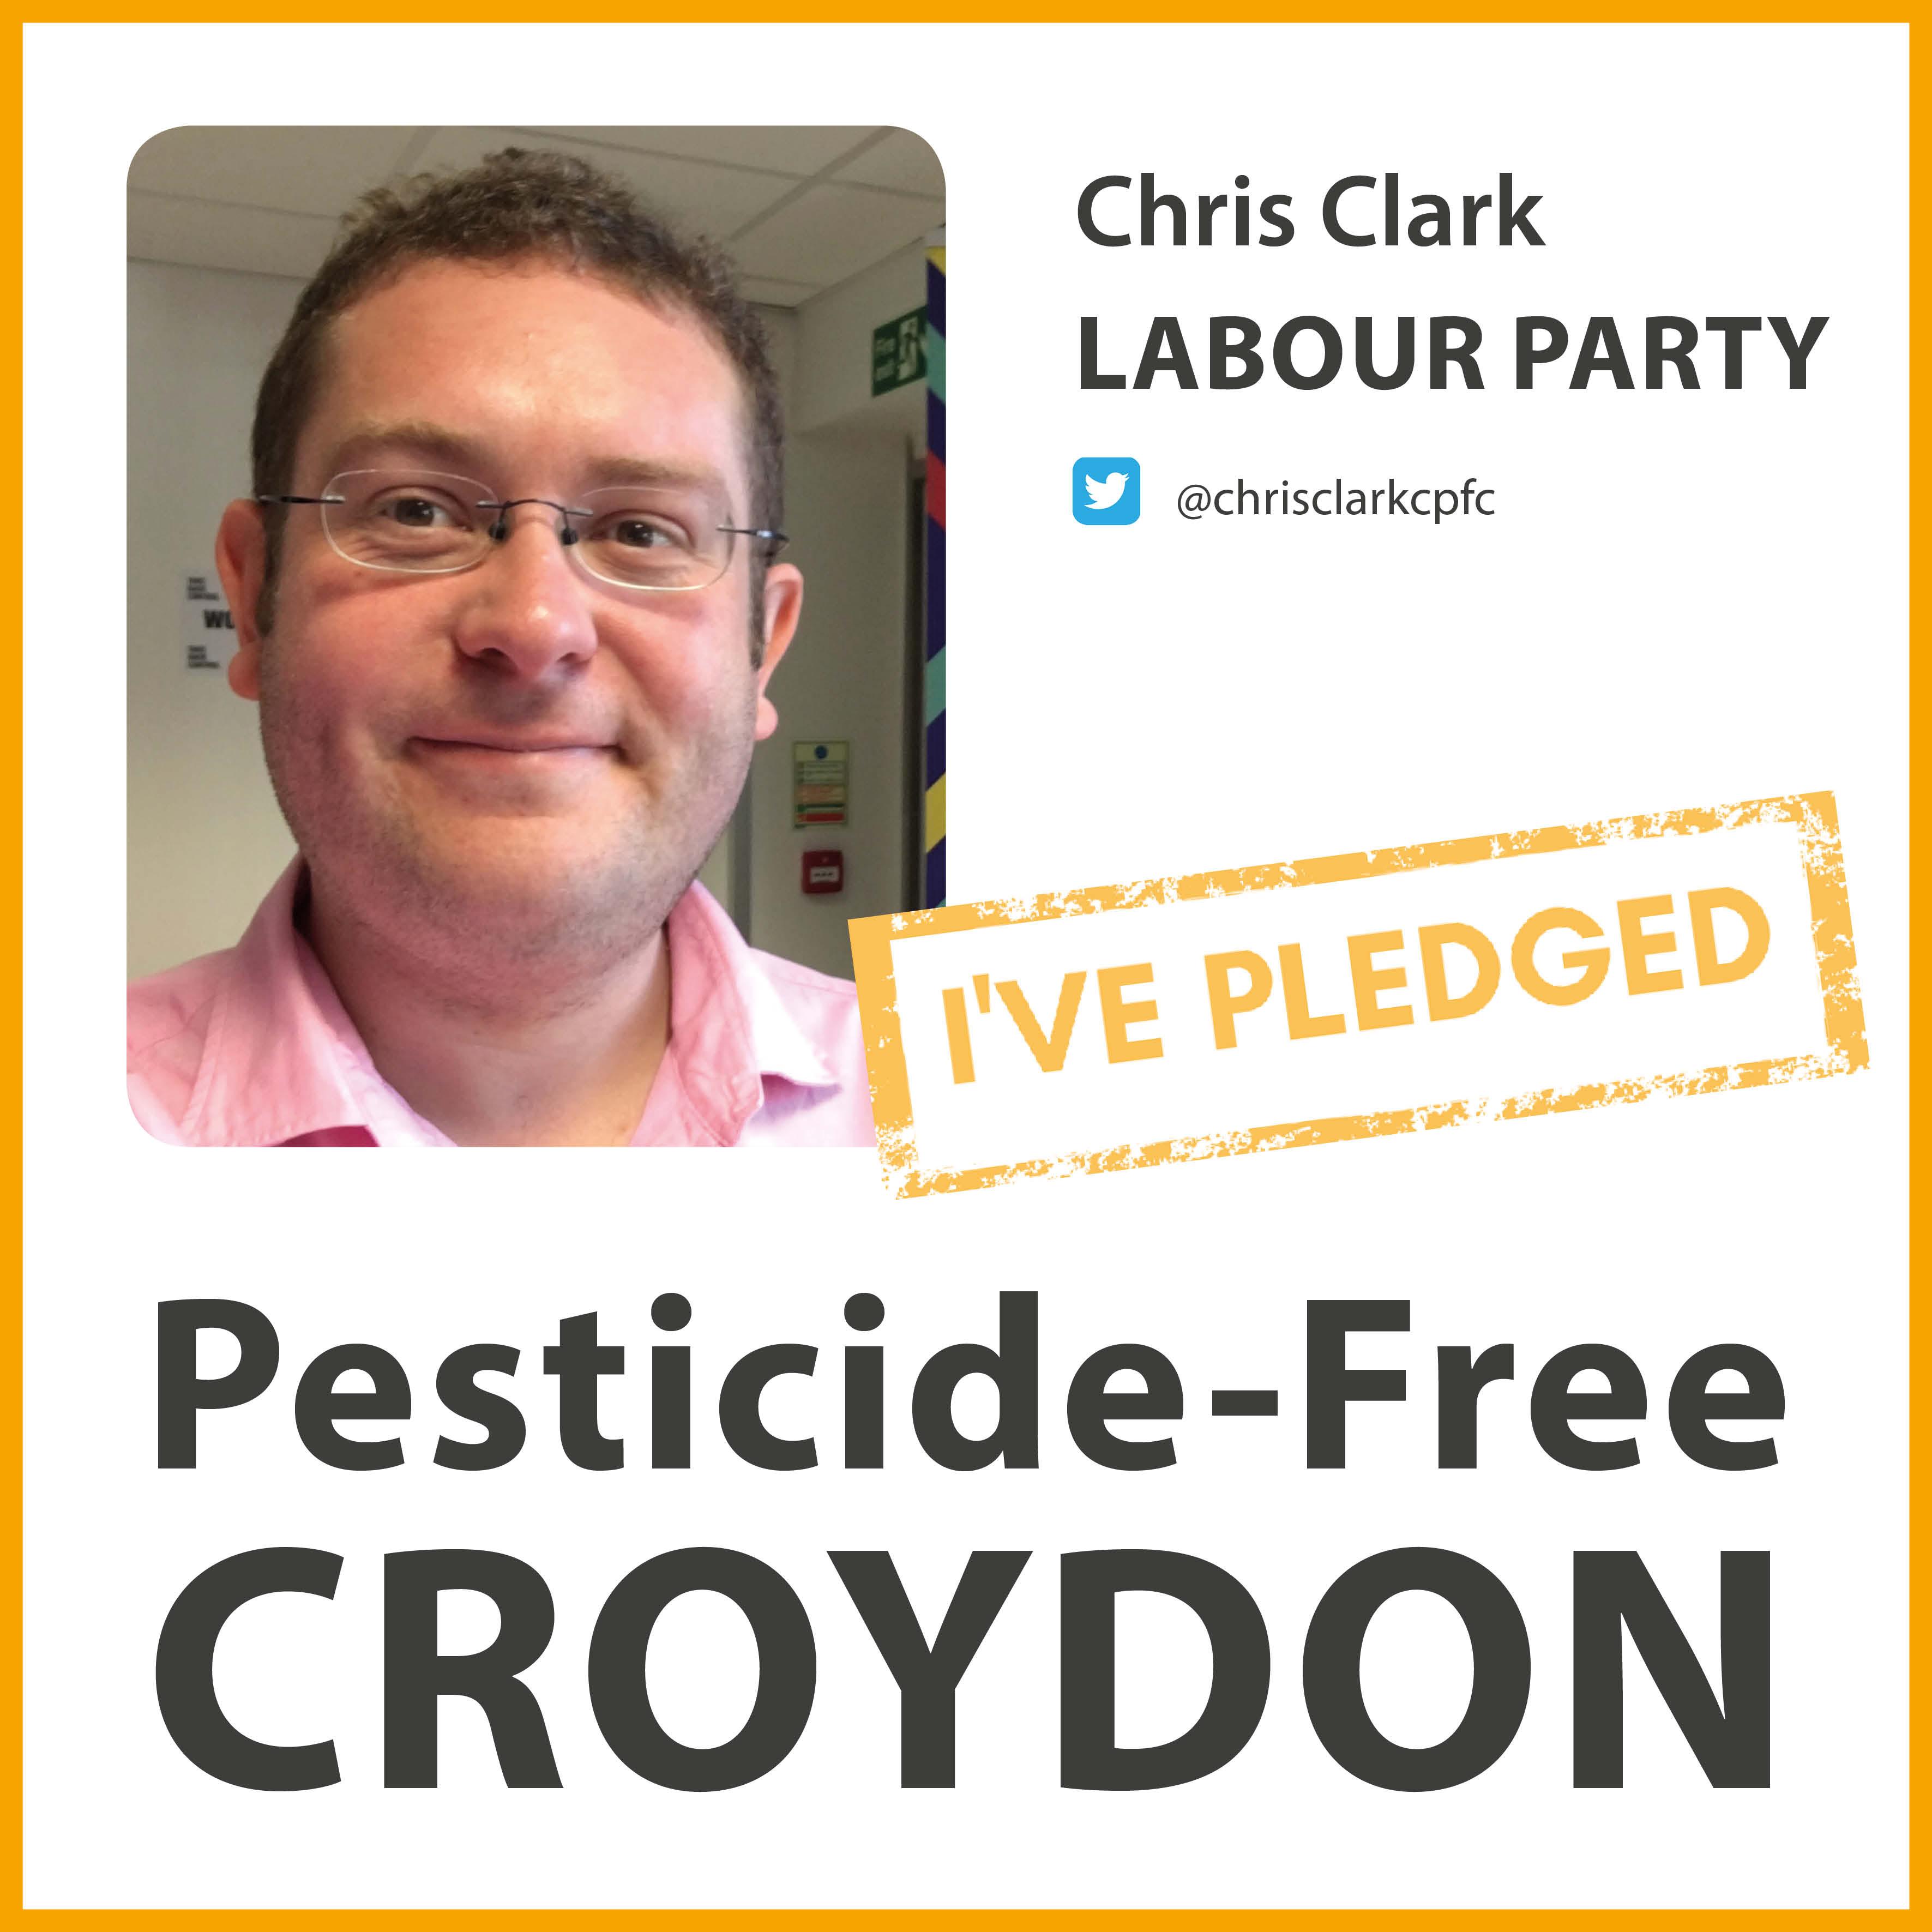 Chris Clark has taken the pesticide-free pledge in Croydon